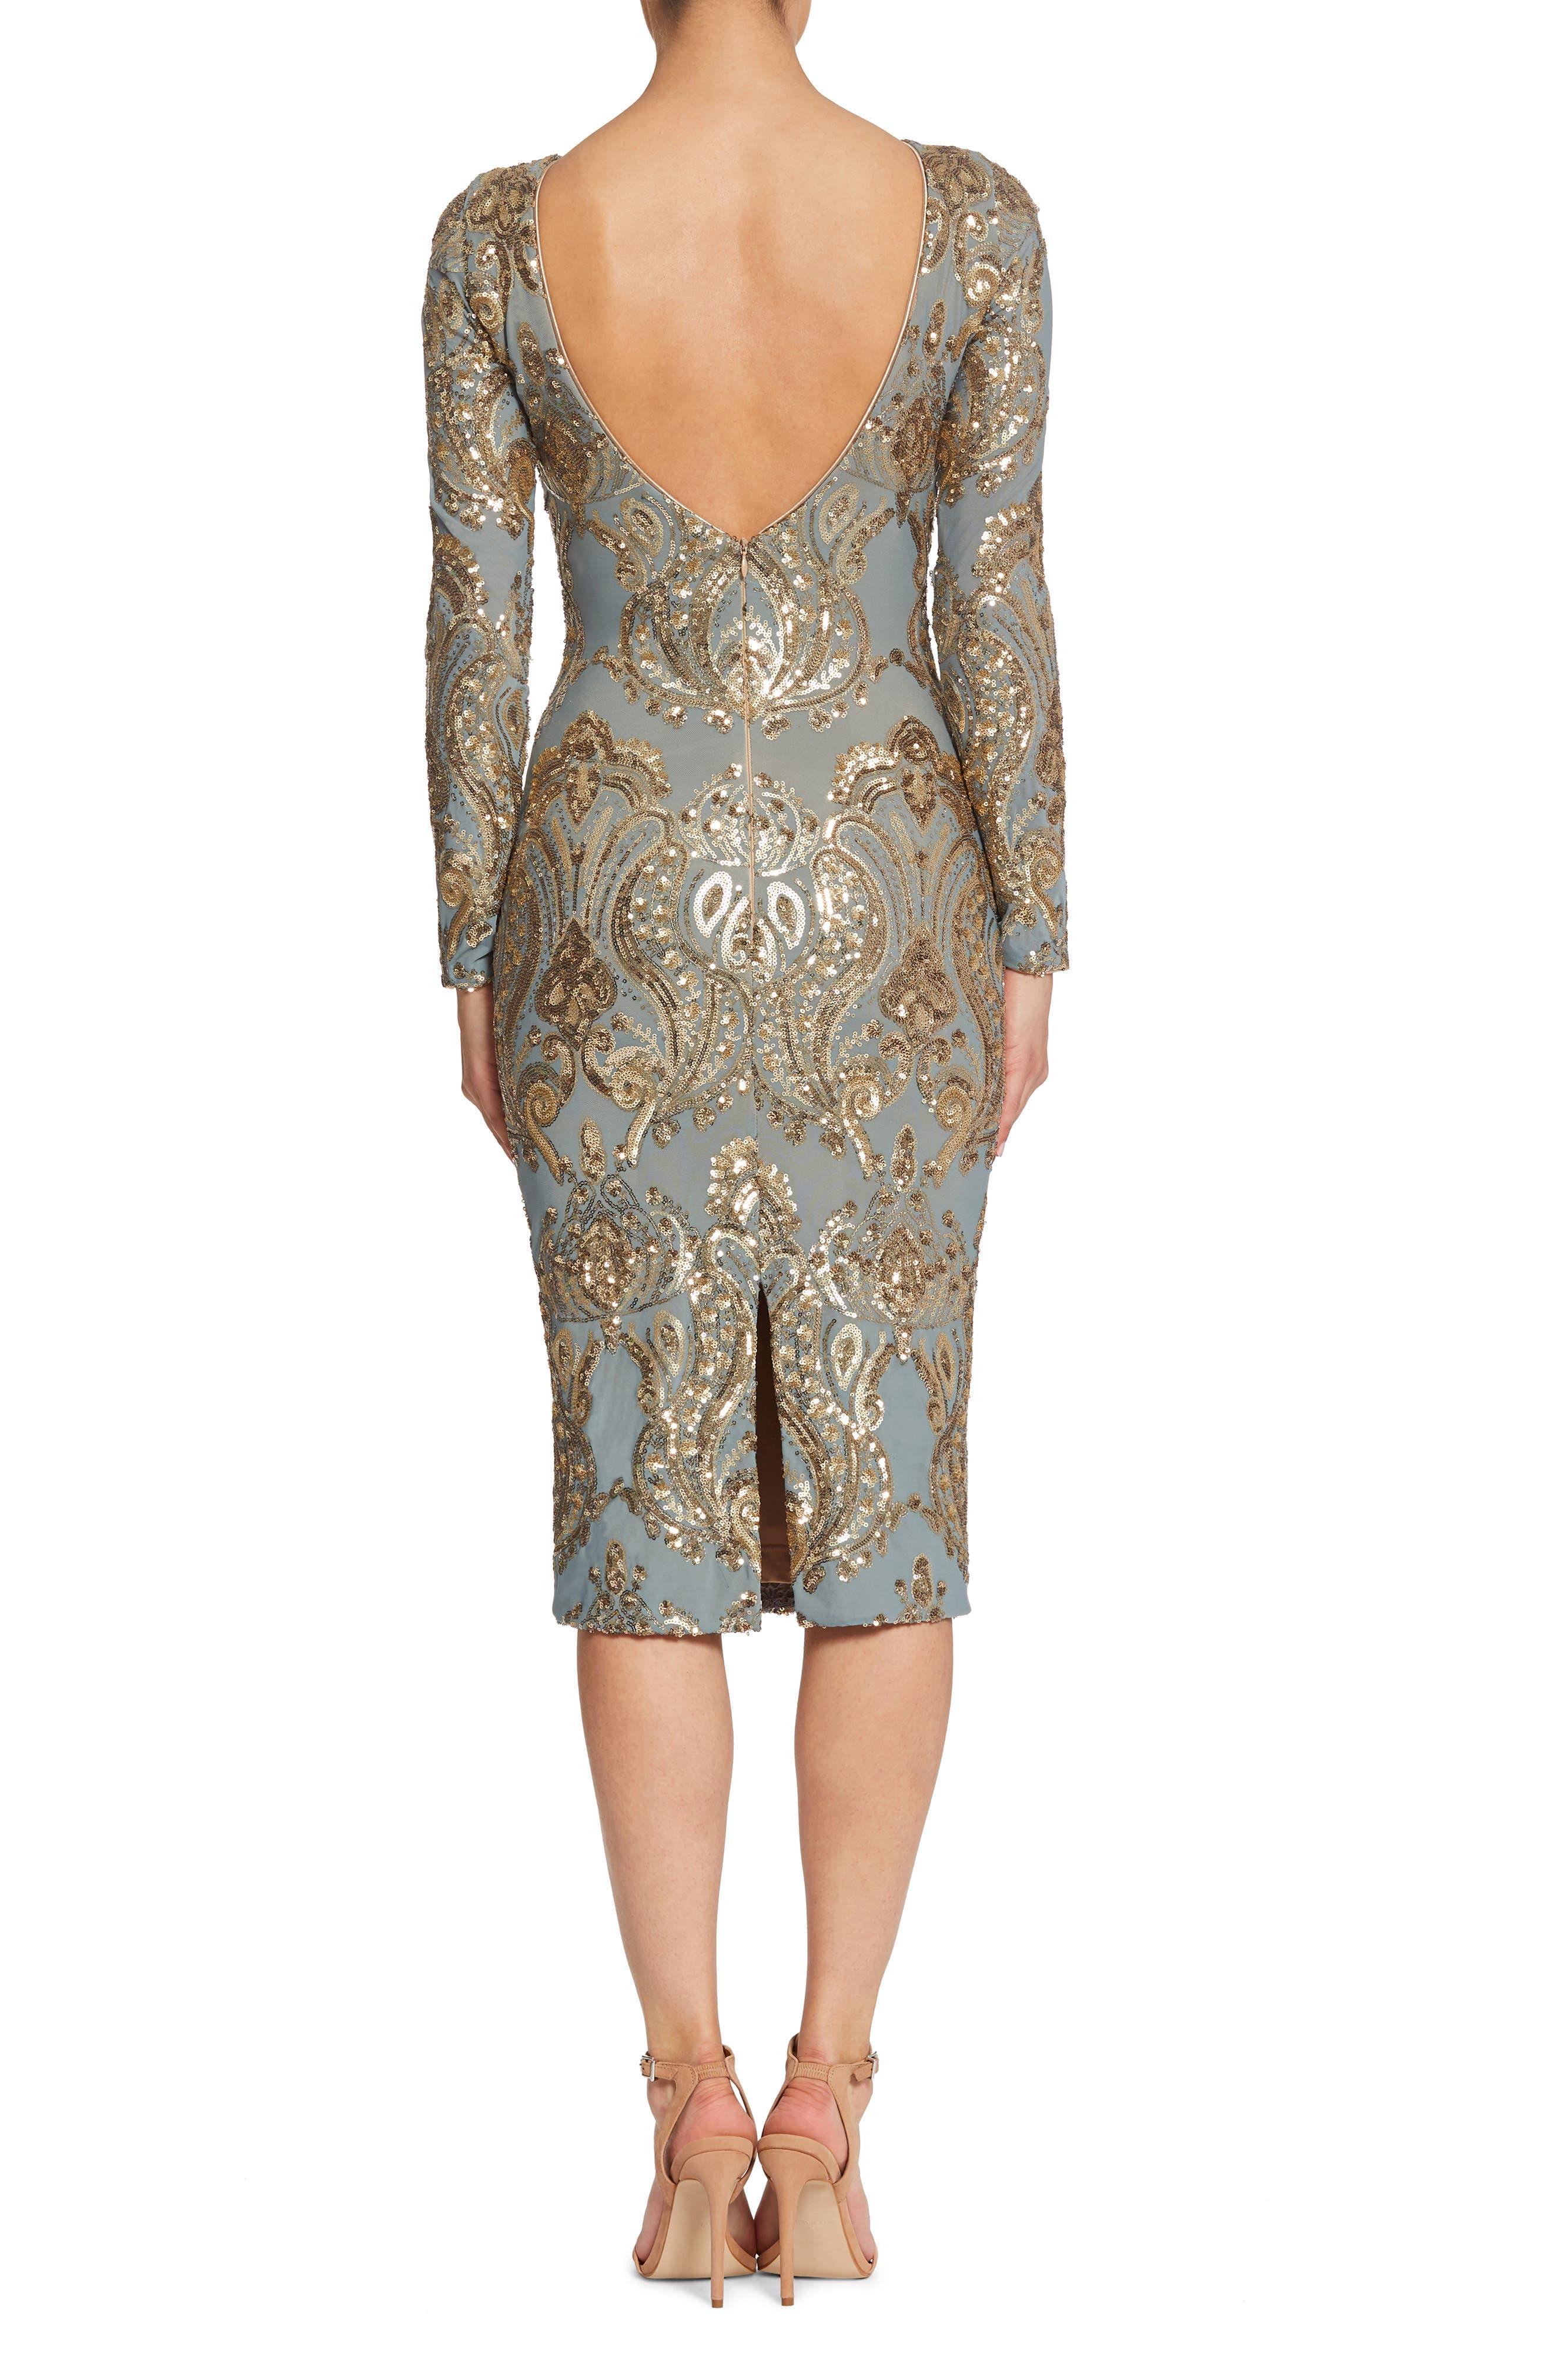 Emery Sequin Sheath Dress,                             Alternate thumbnail 2, color,                             Teal/ Gold